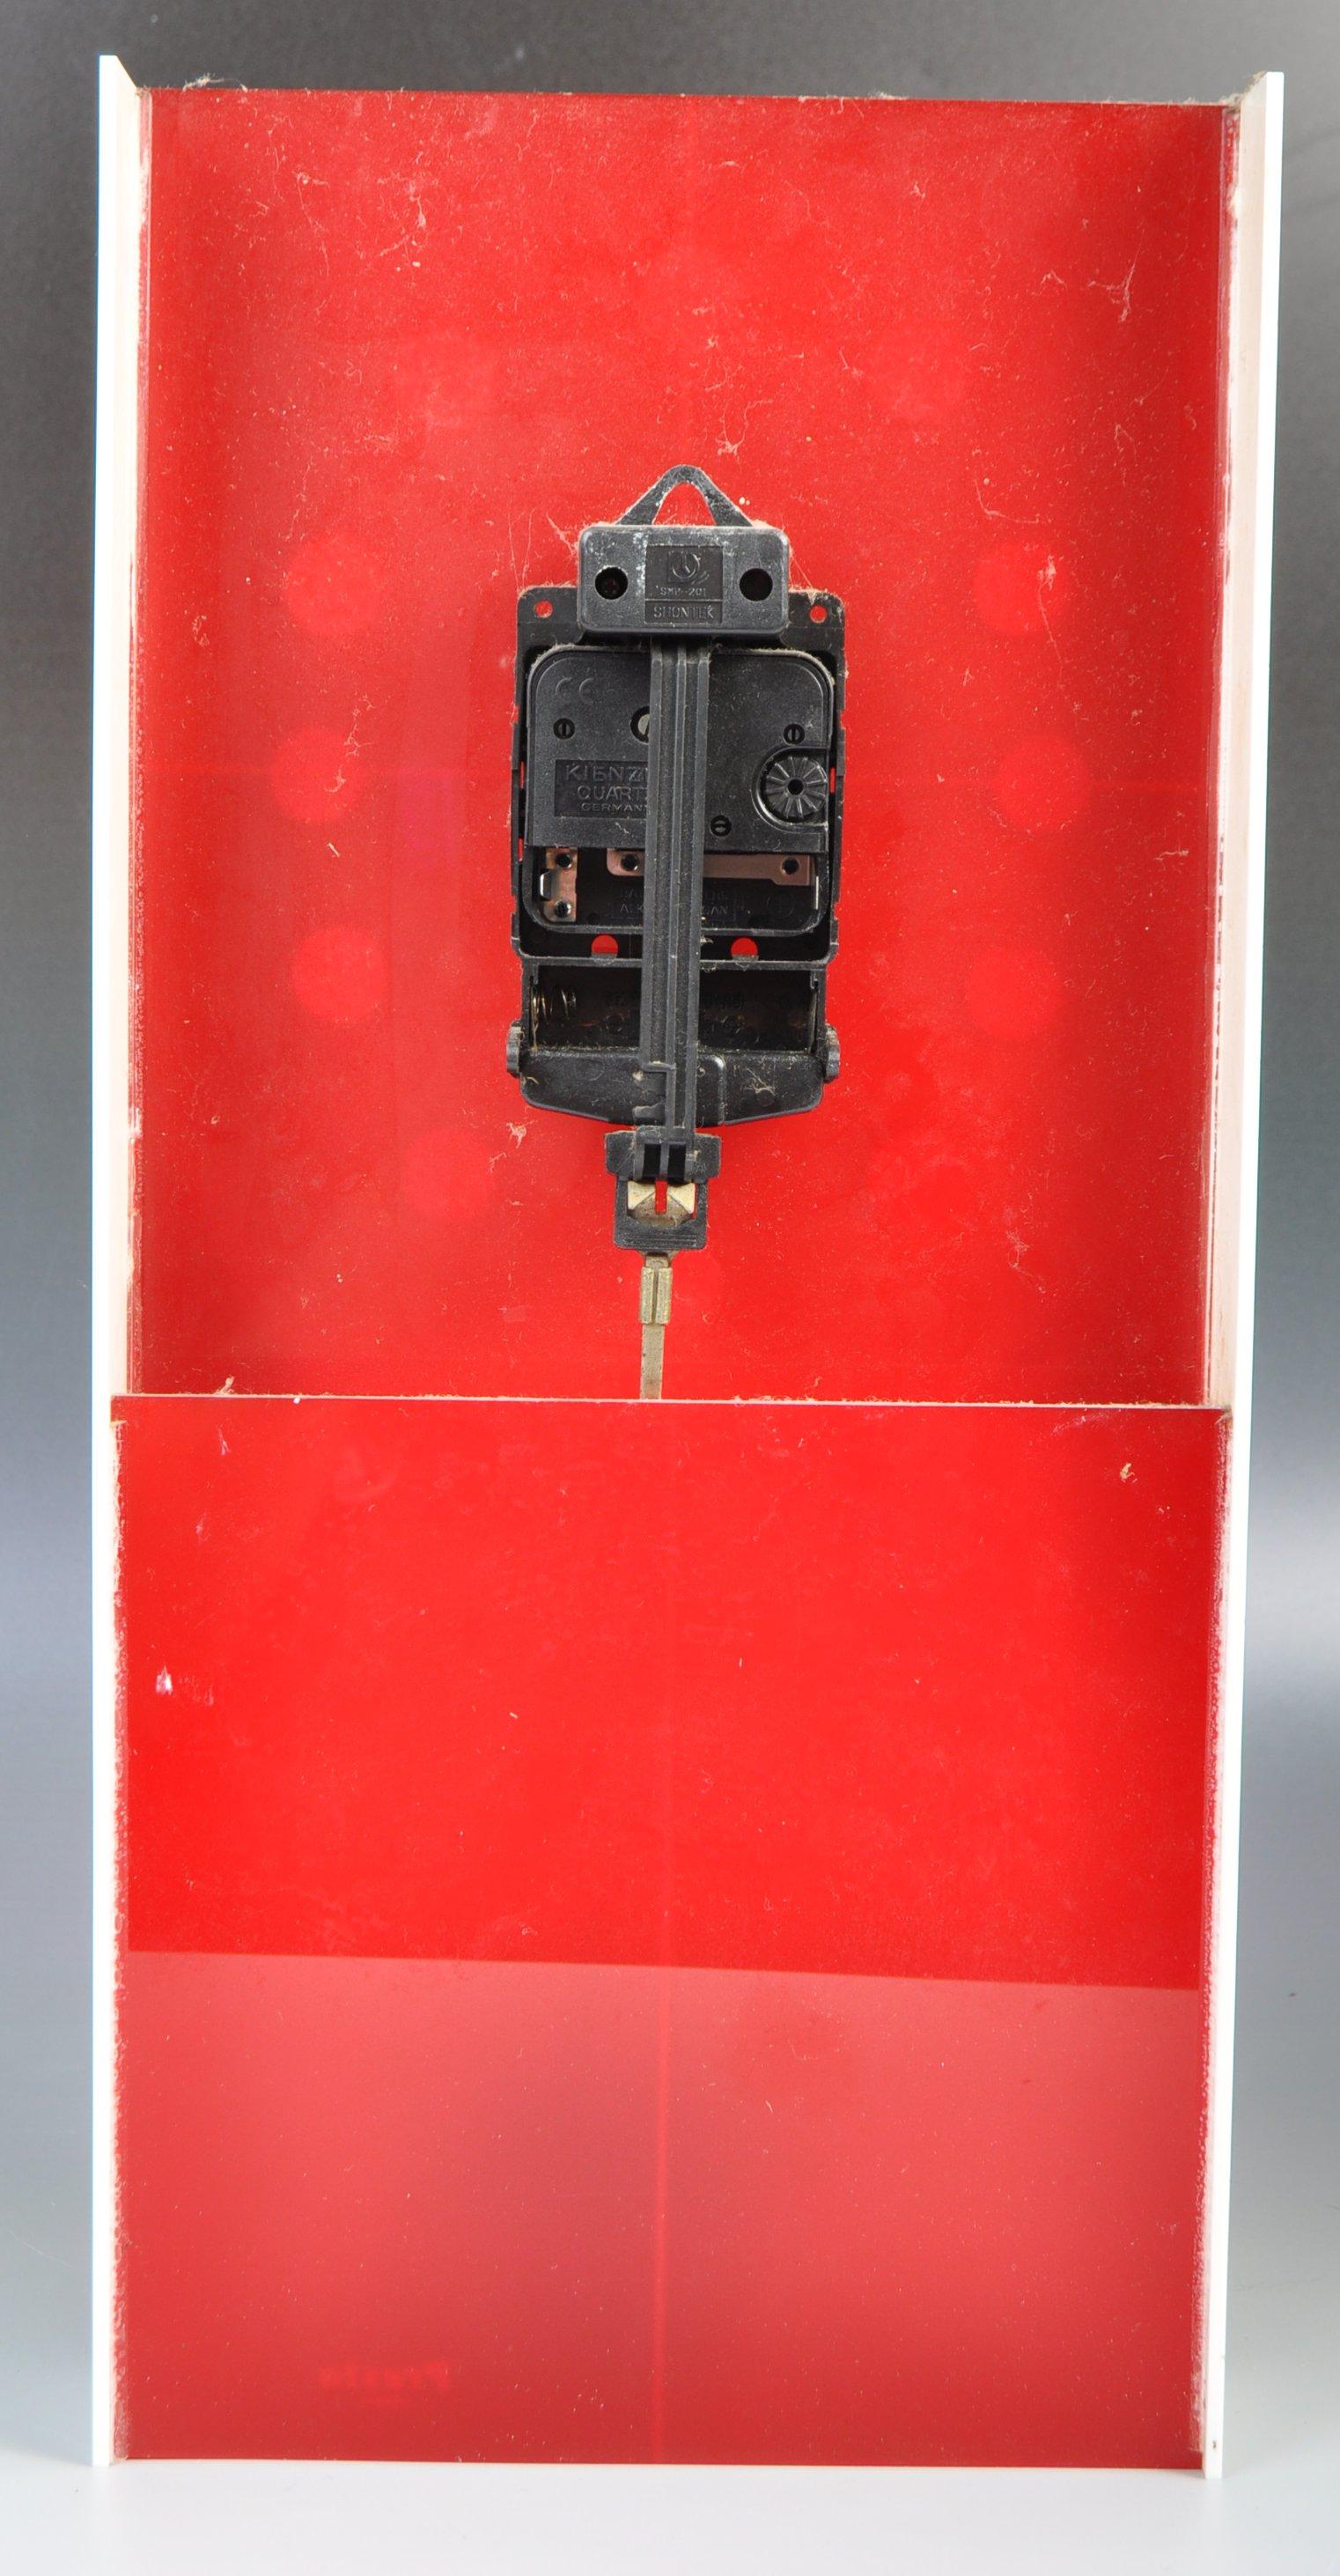 PRESTA JAPANESE RETRO 1970'S ACRYLIC WALL HANGING CLOCK - Image 4 of 4